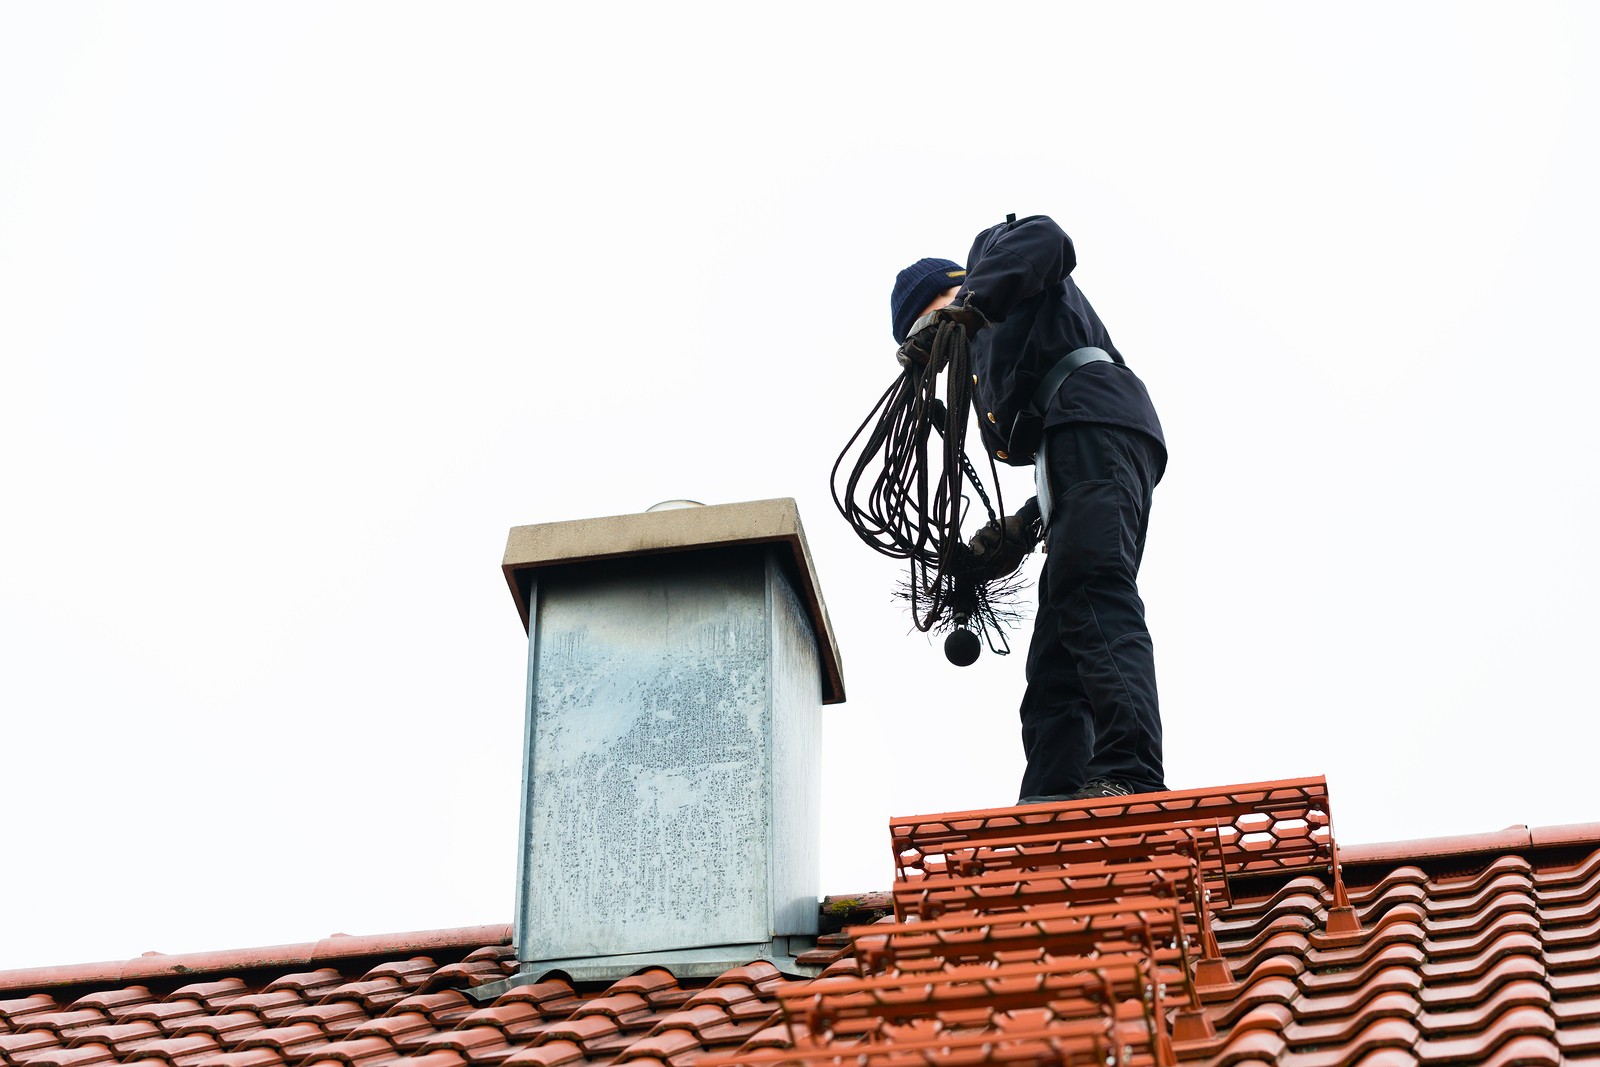 Как чистят вентиляцию в многоквартирном доме